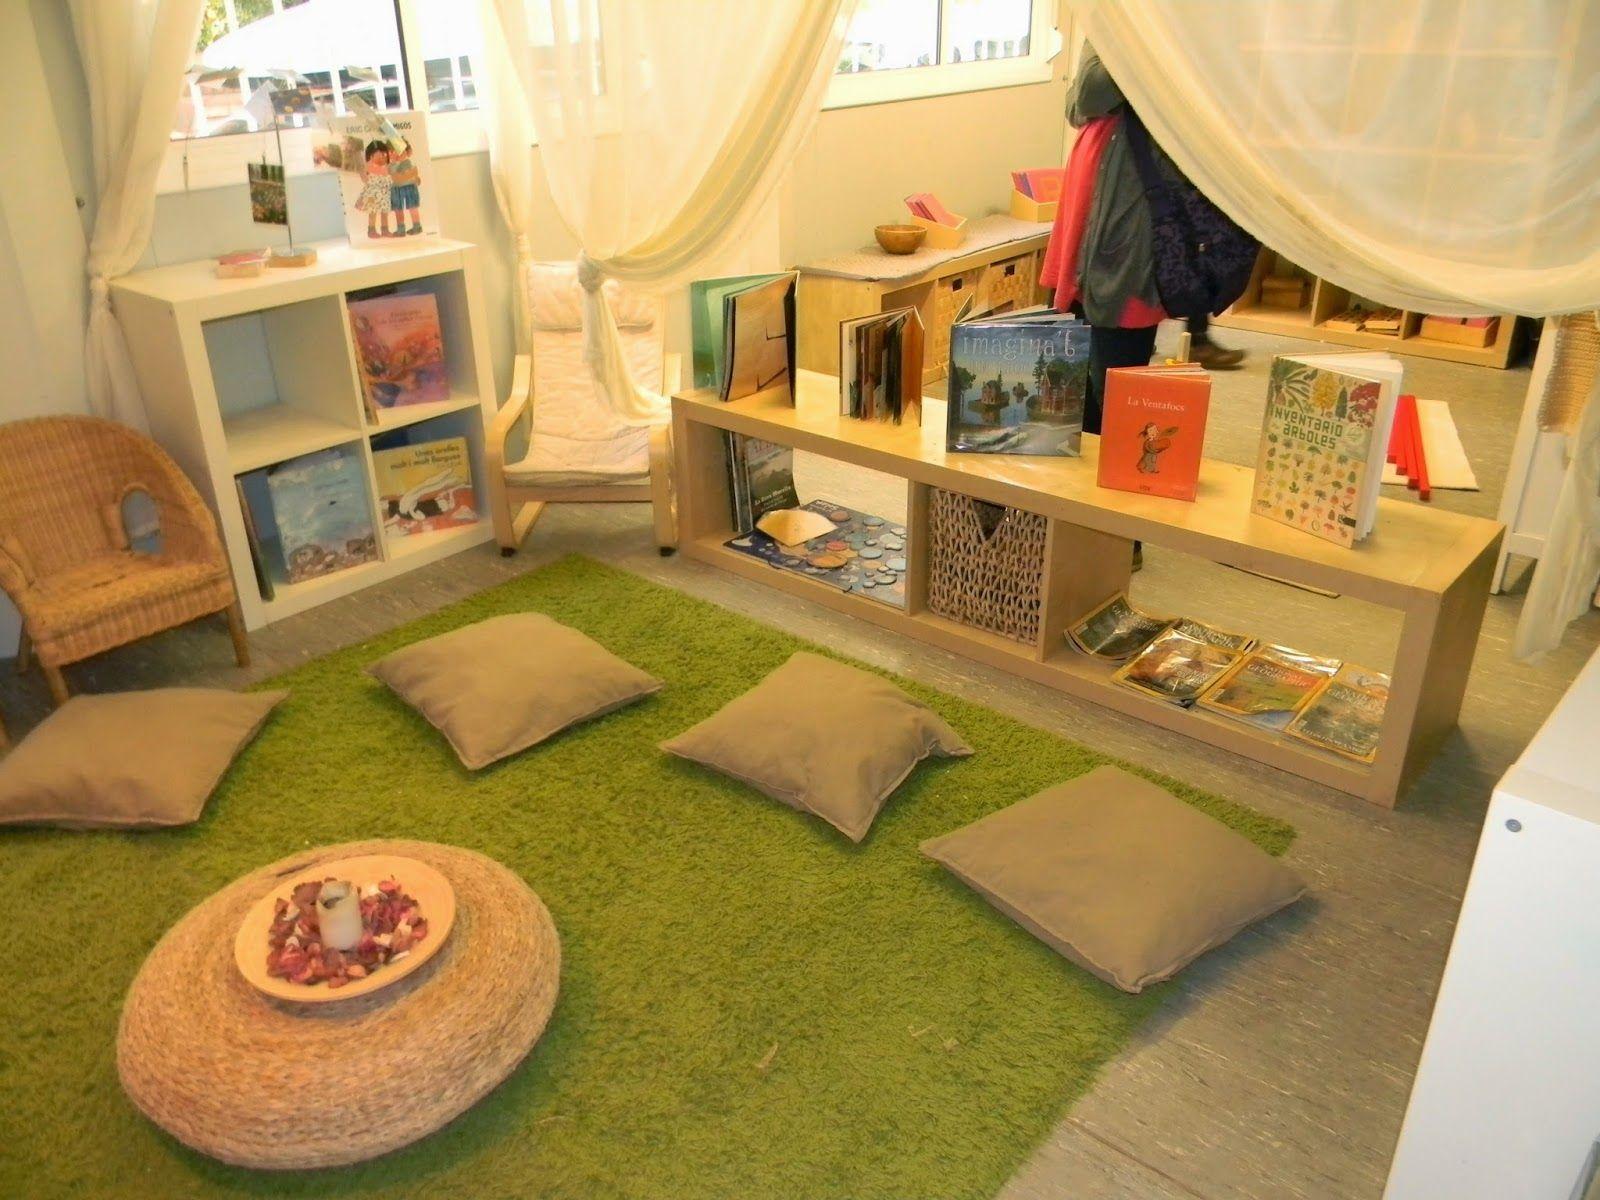 Klassenzimmergestaltung grundschule leseecke for Raumgestaltung schule